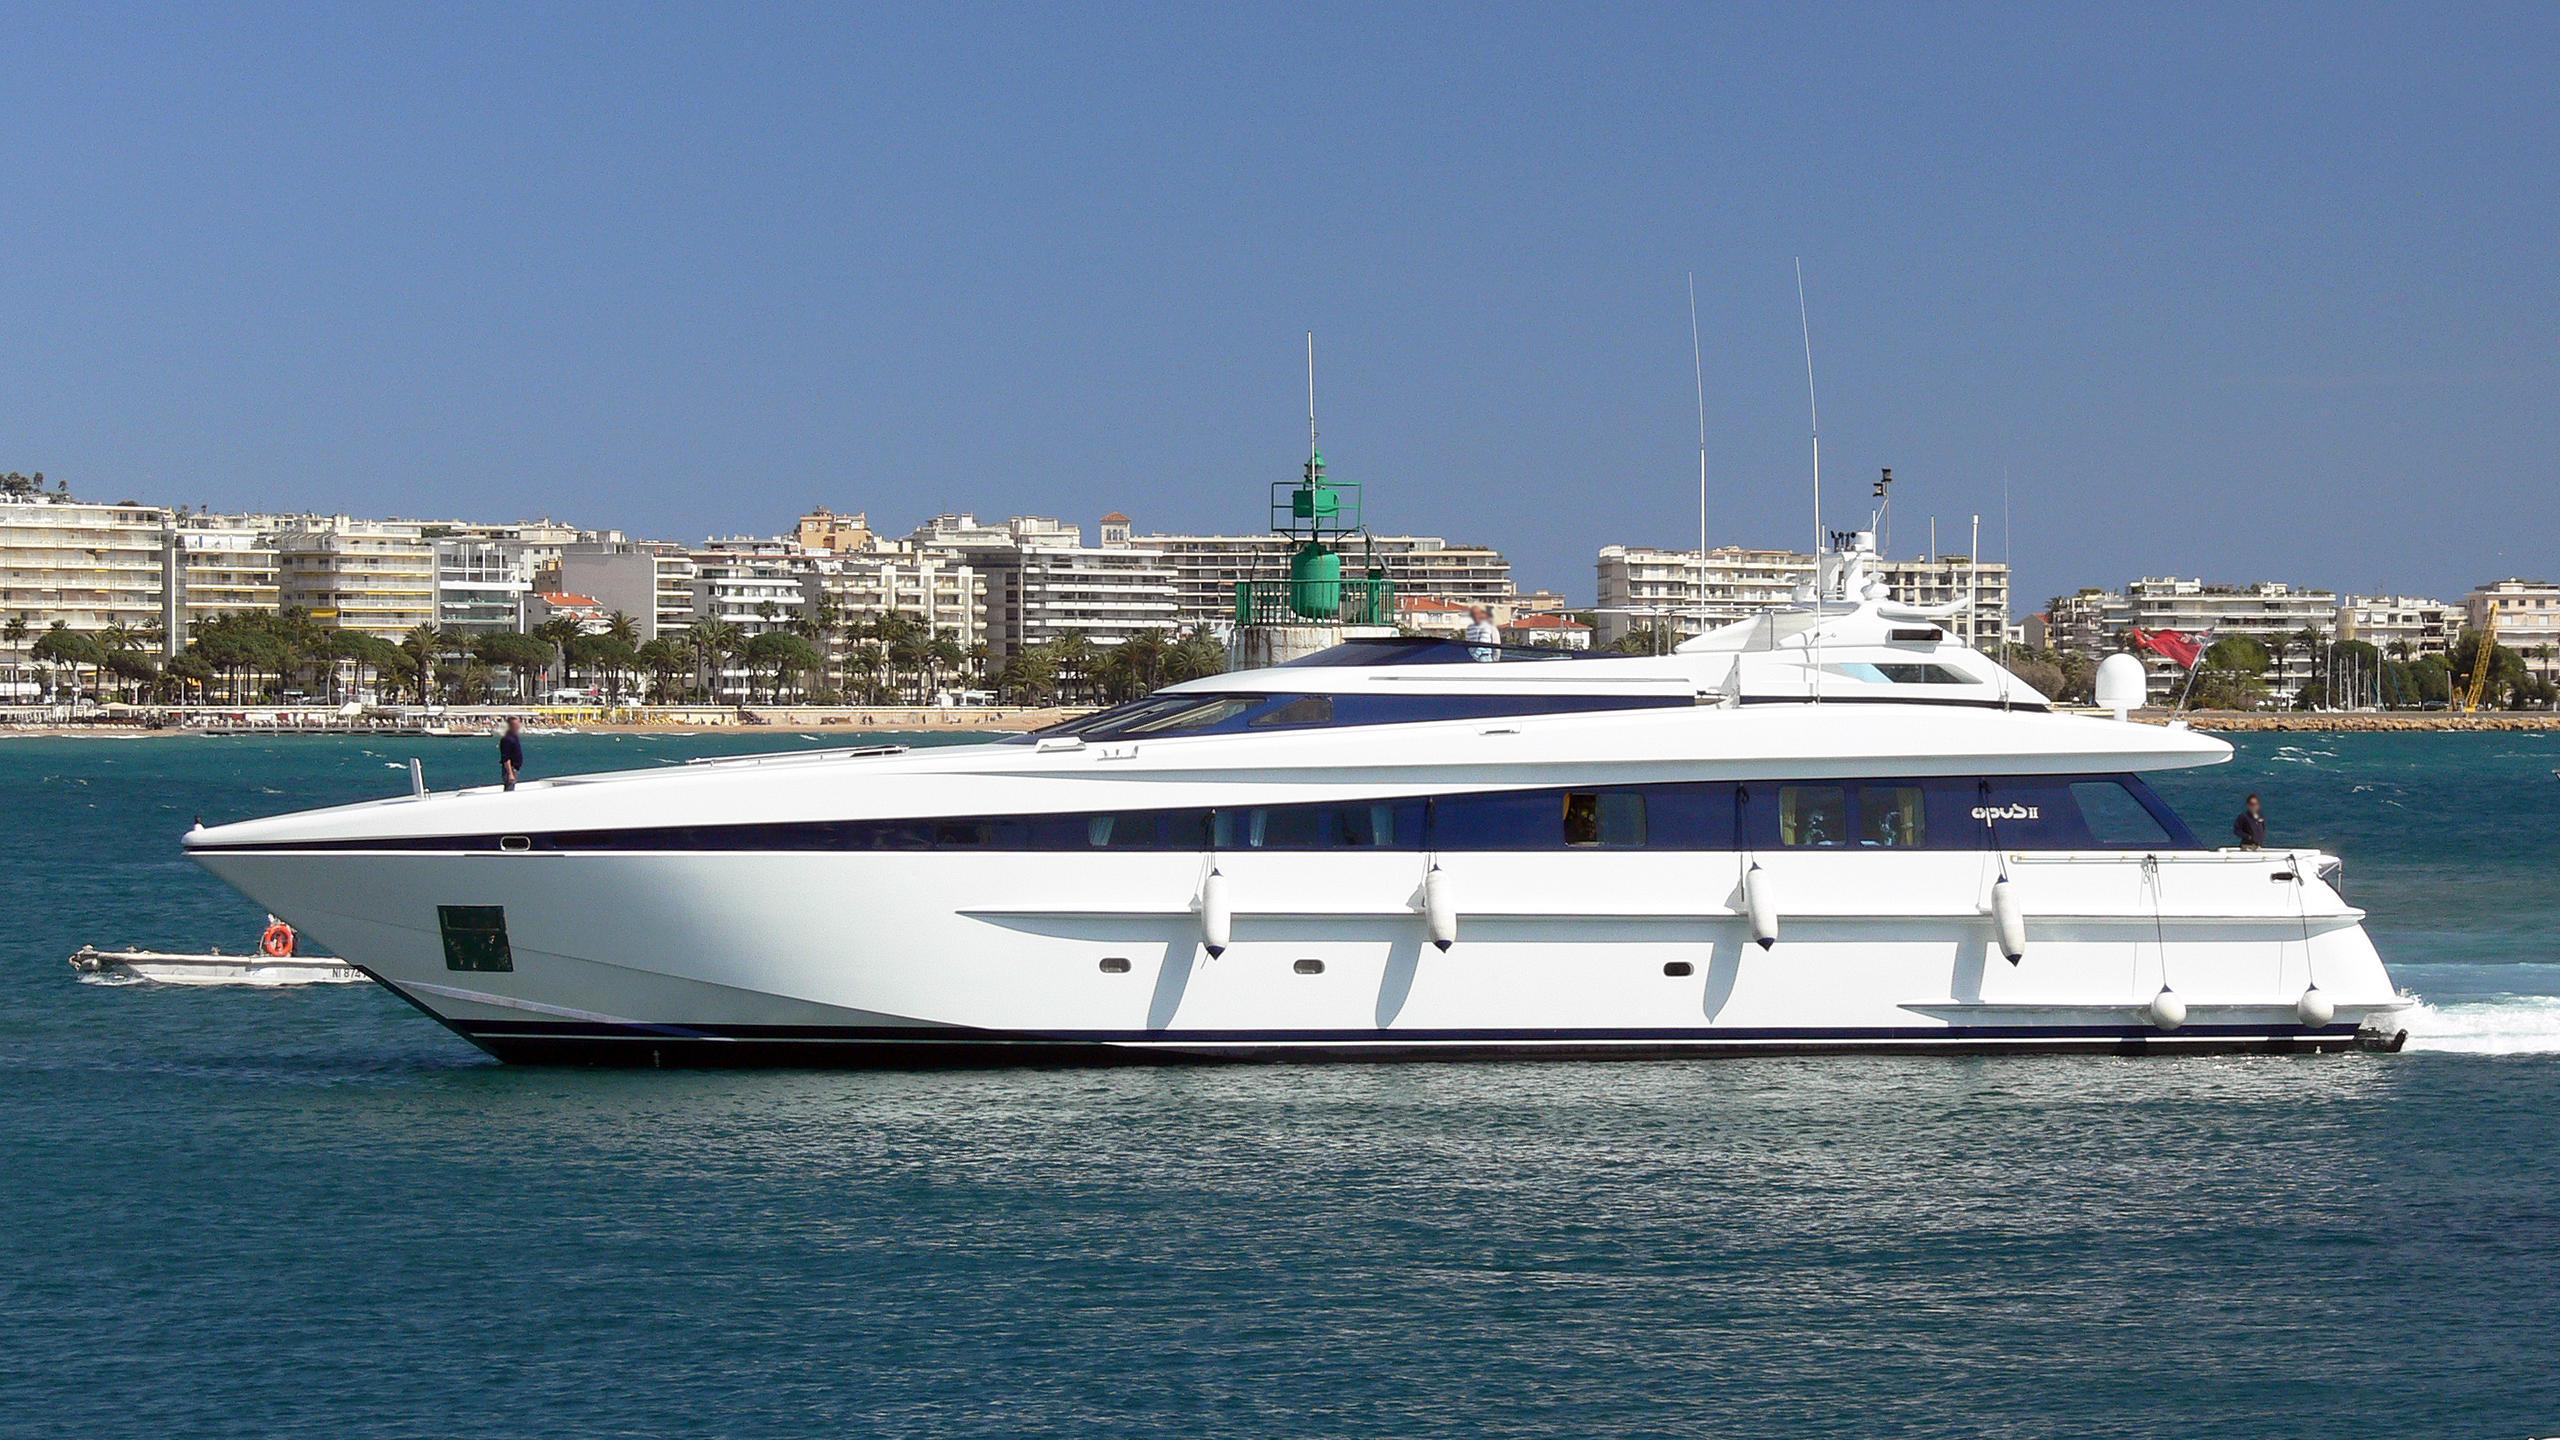 opus-ii-motor-yacht-heesen-1997-36m-profile